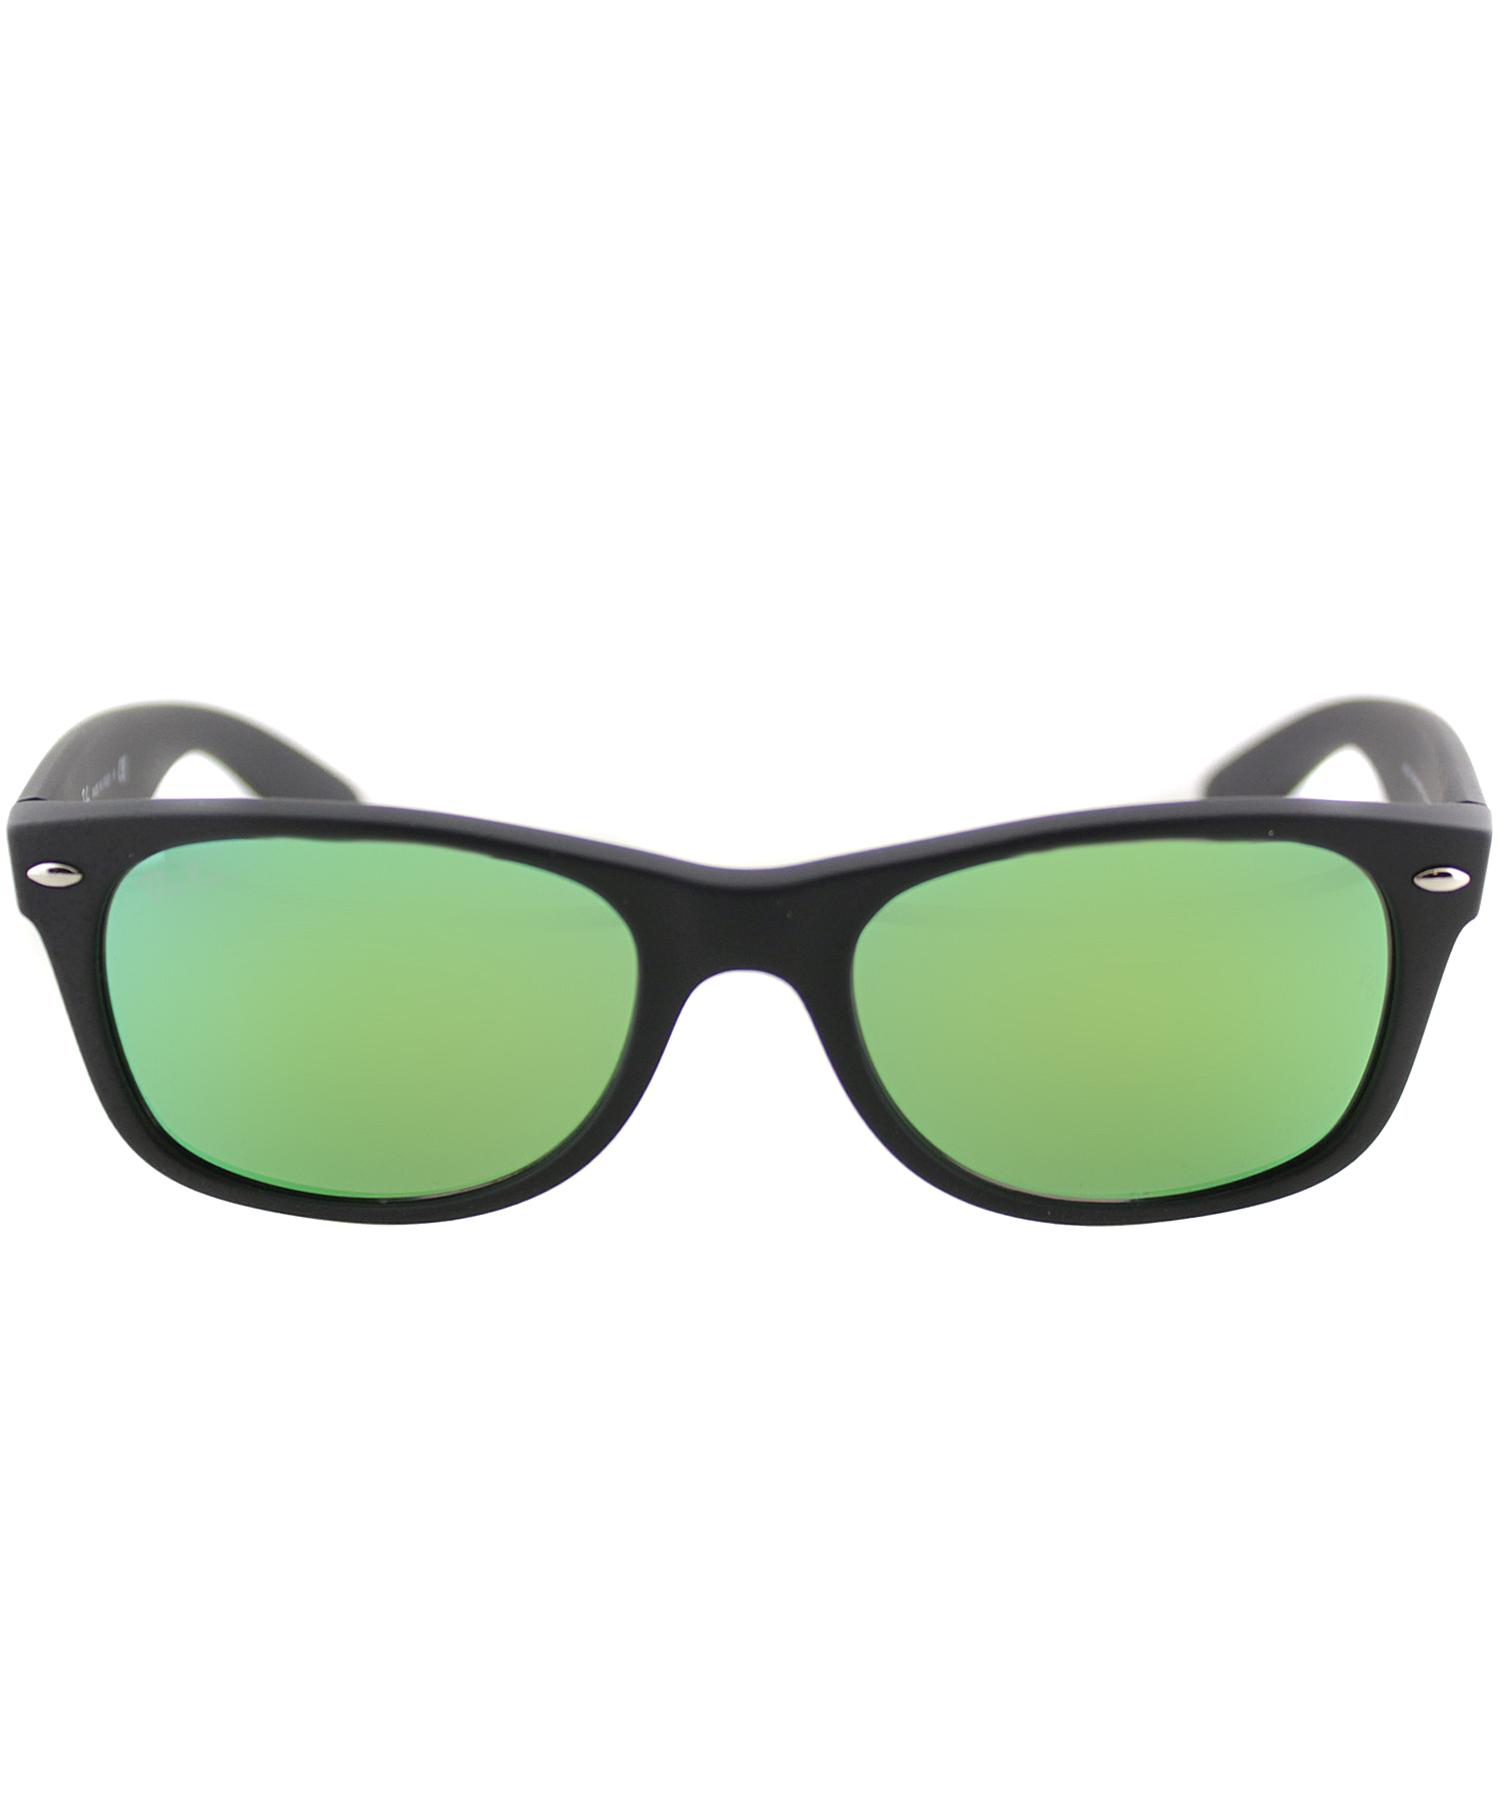 Quay Eyewear Wayfarer Sunglasses With Removable Lens www ...